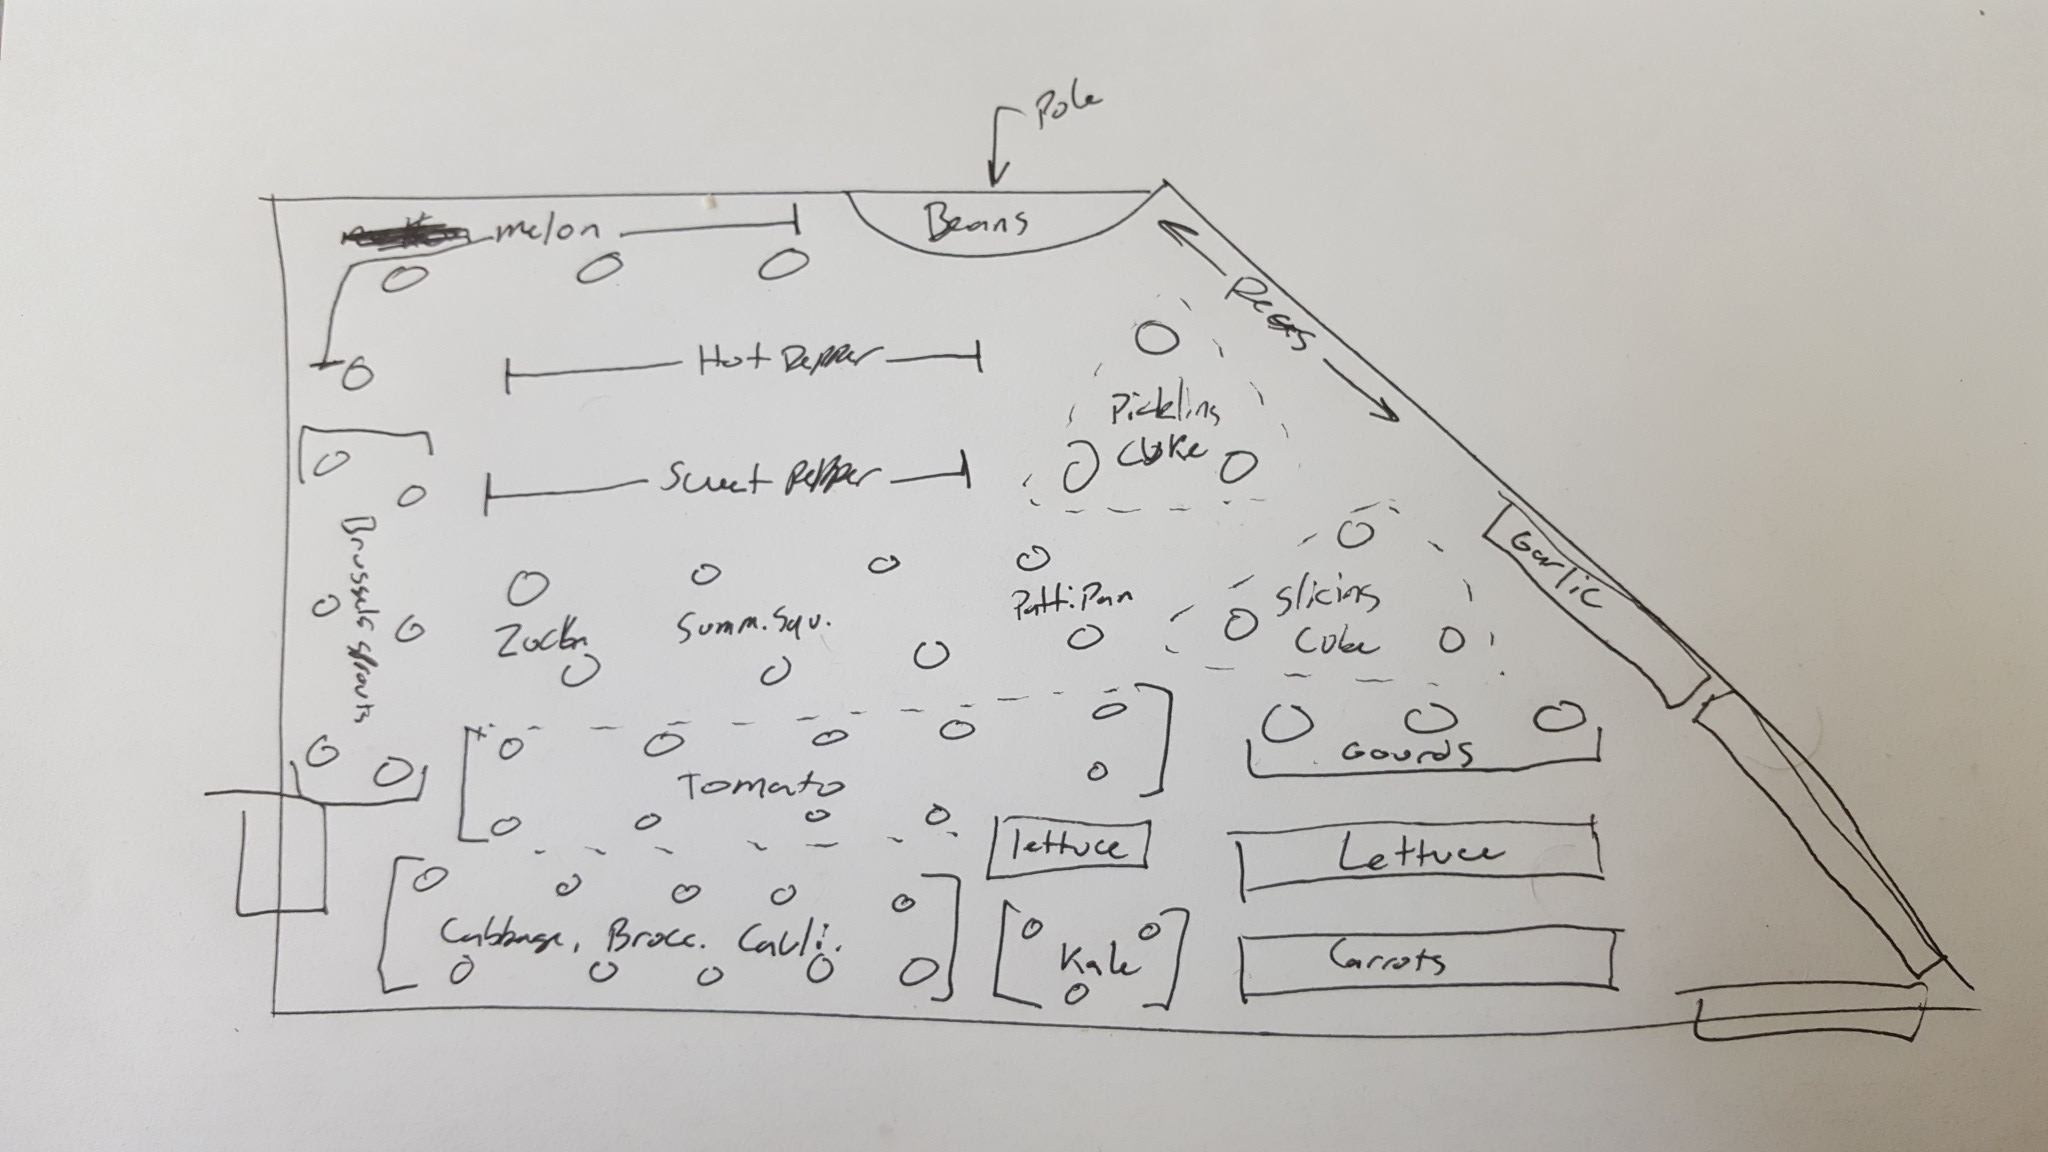 A little back-of-the-envelope planning for the garden plot.